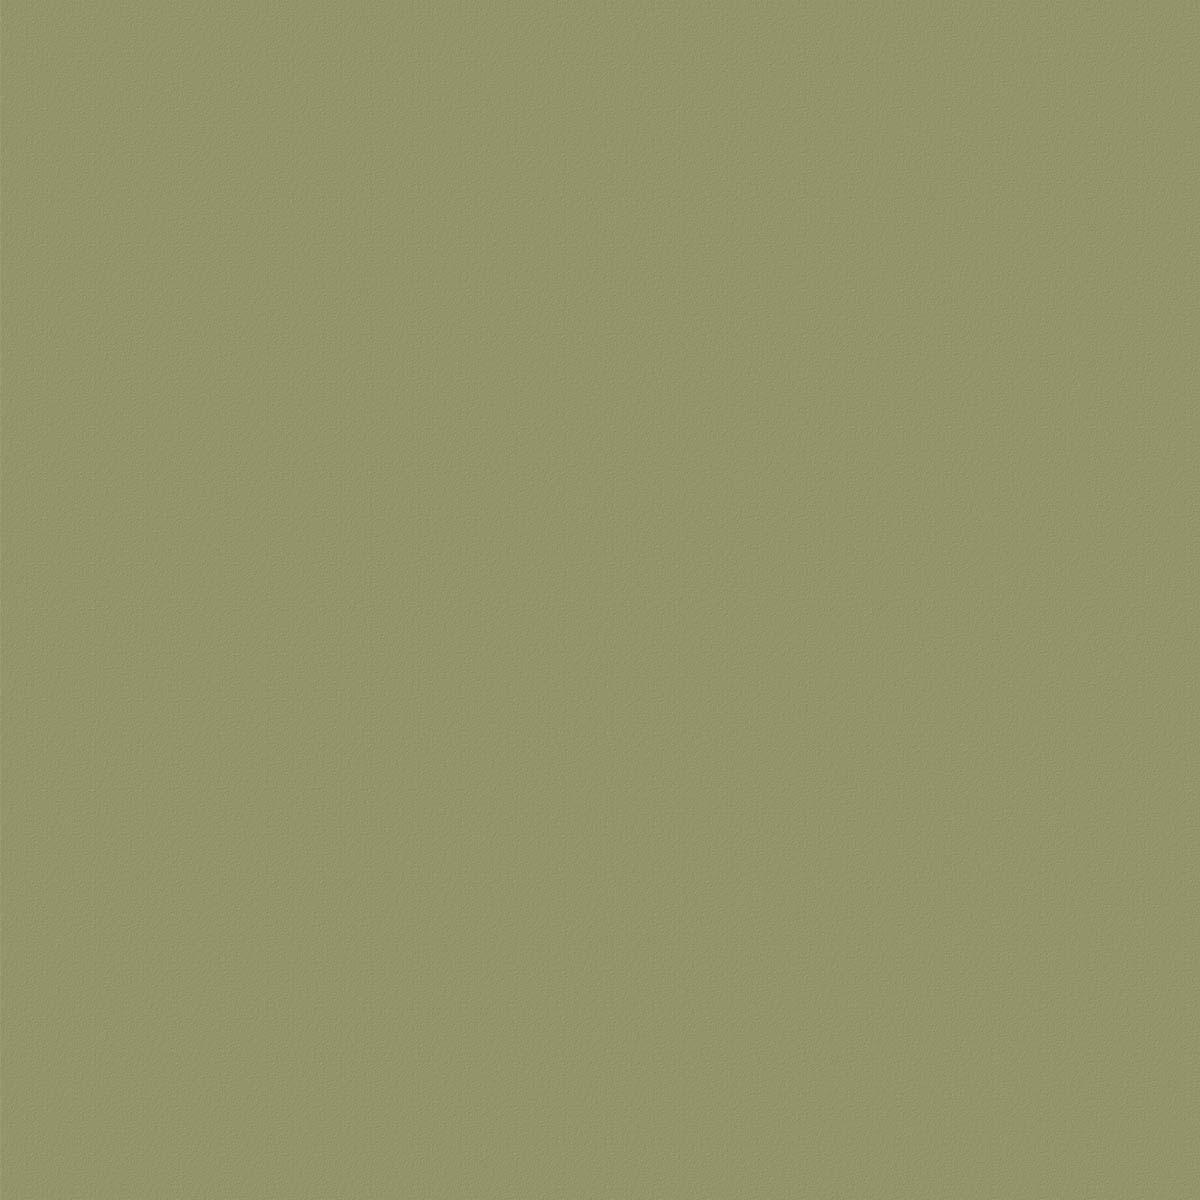 HF1959 VL Pistachio Green